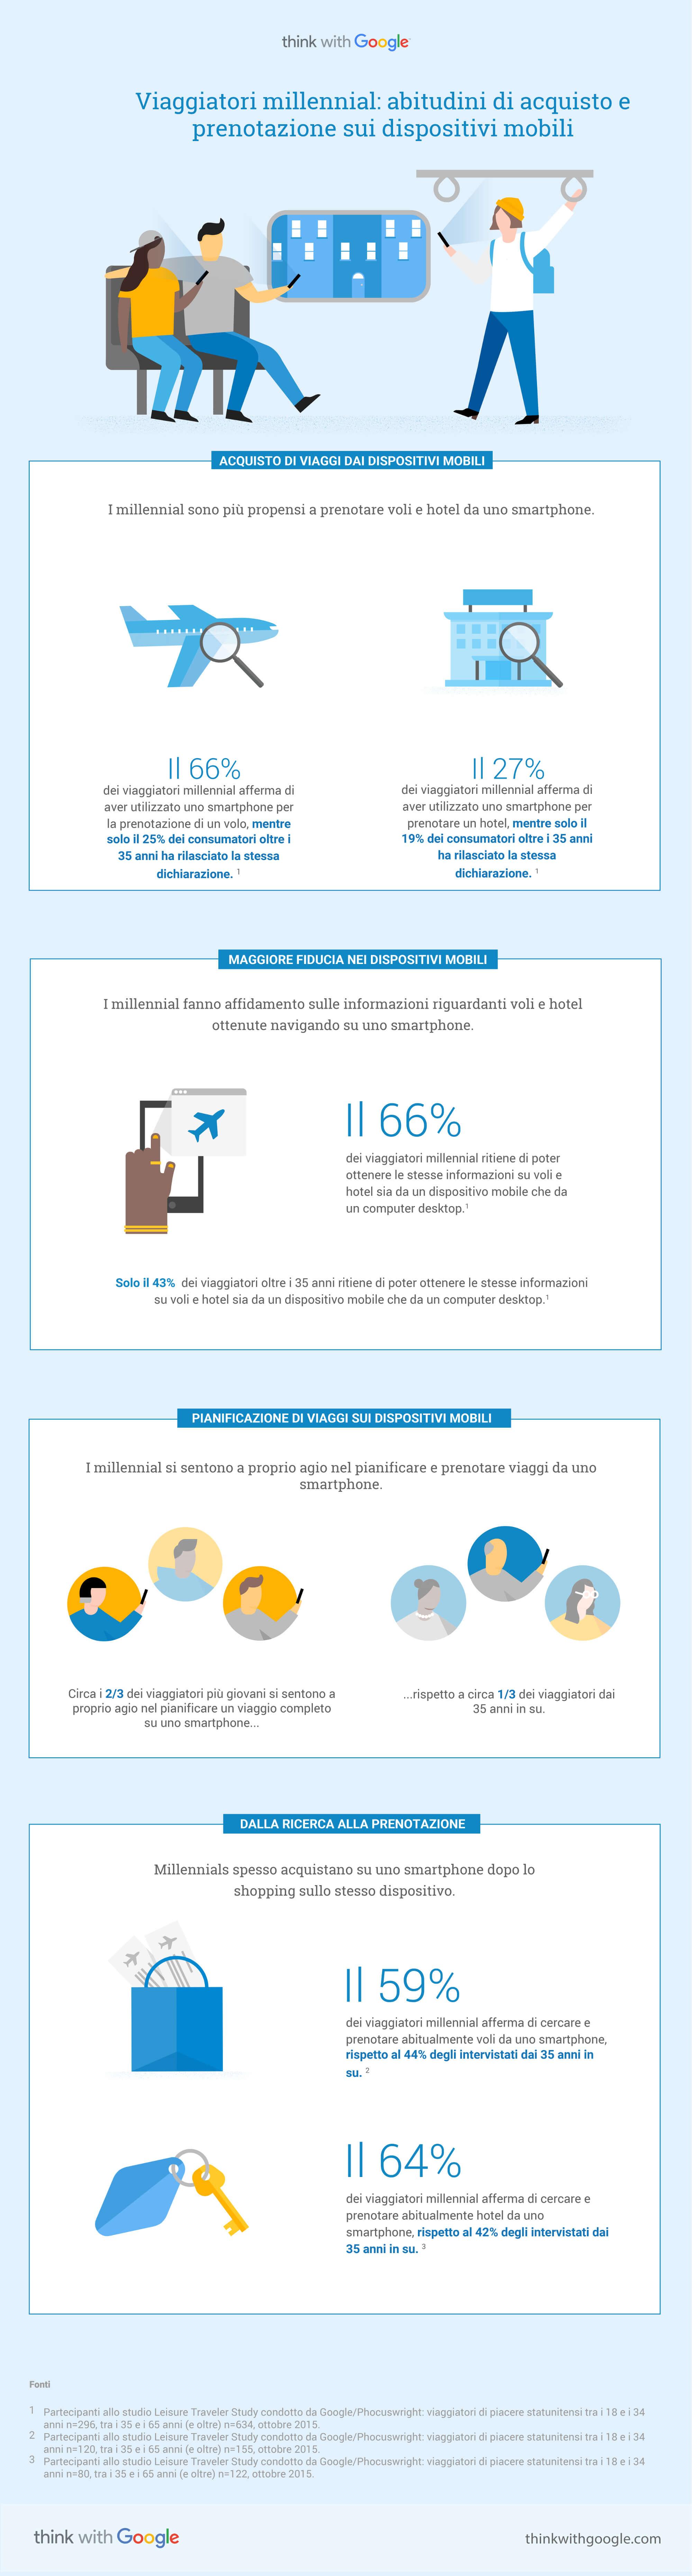 infografica-google-millennial-travelers-mobile-shopping-booking-behavior